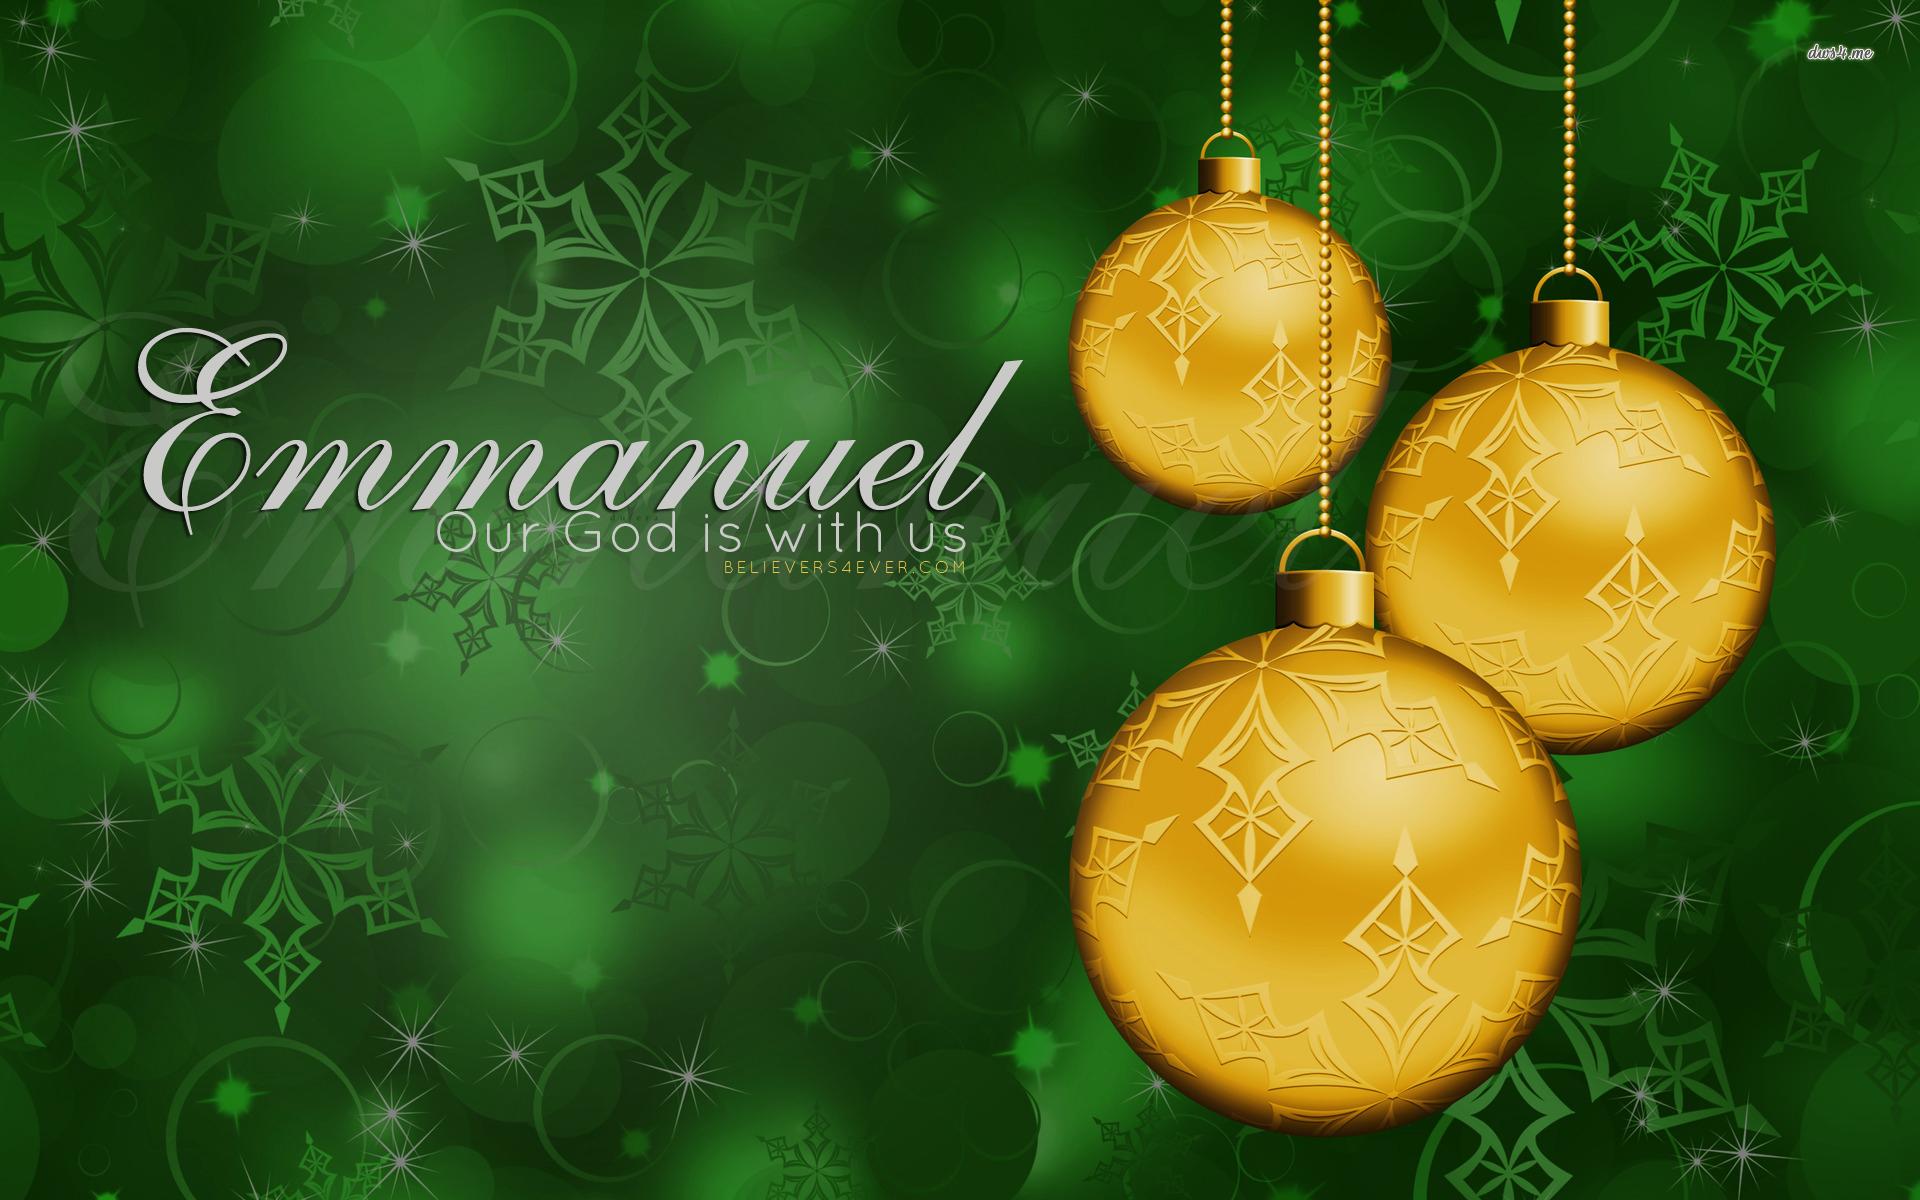 Emmanuel Christian Christmas Desktop wallpaper